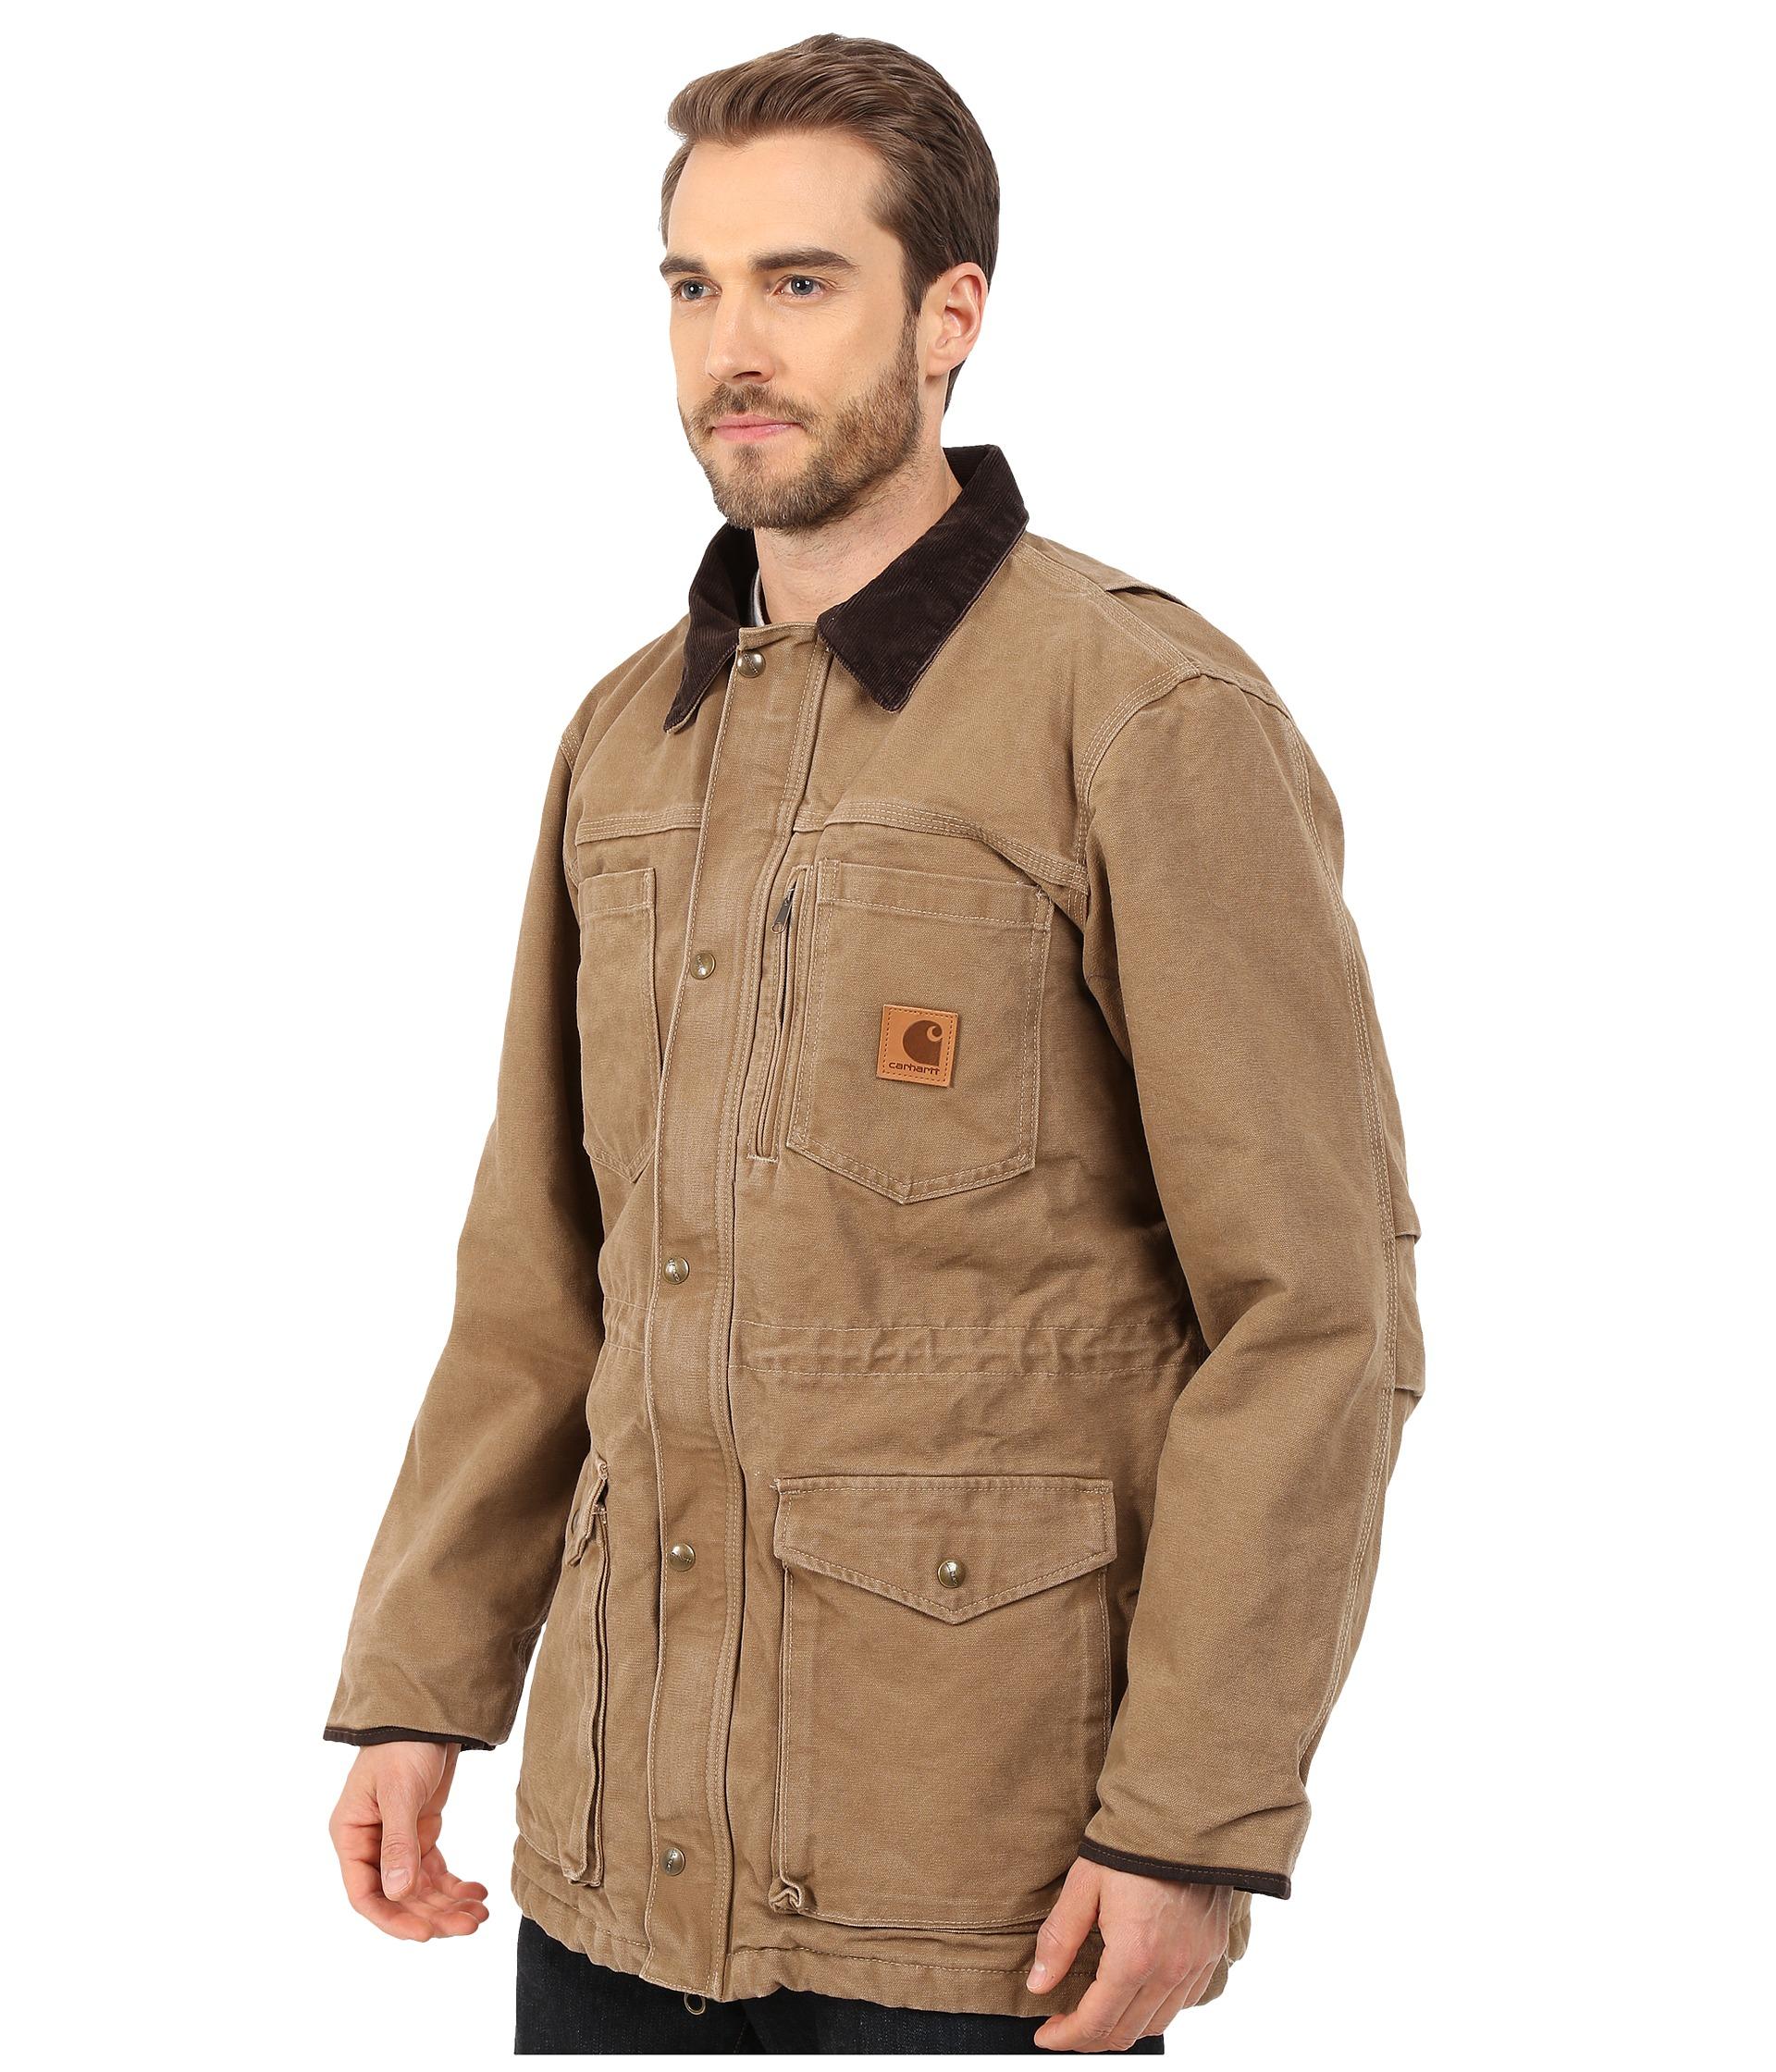 Big And Tall Pea Coats For Men - Tradingbasis